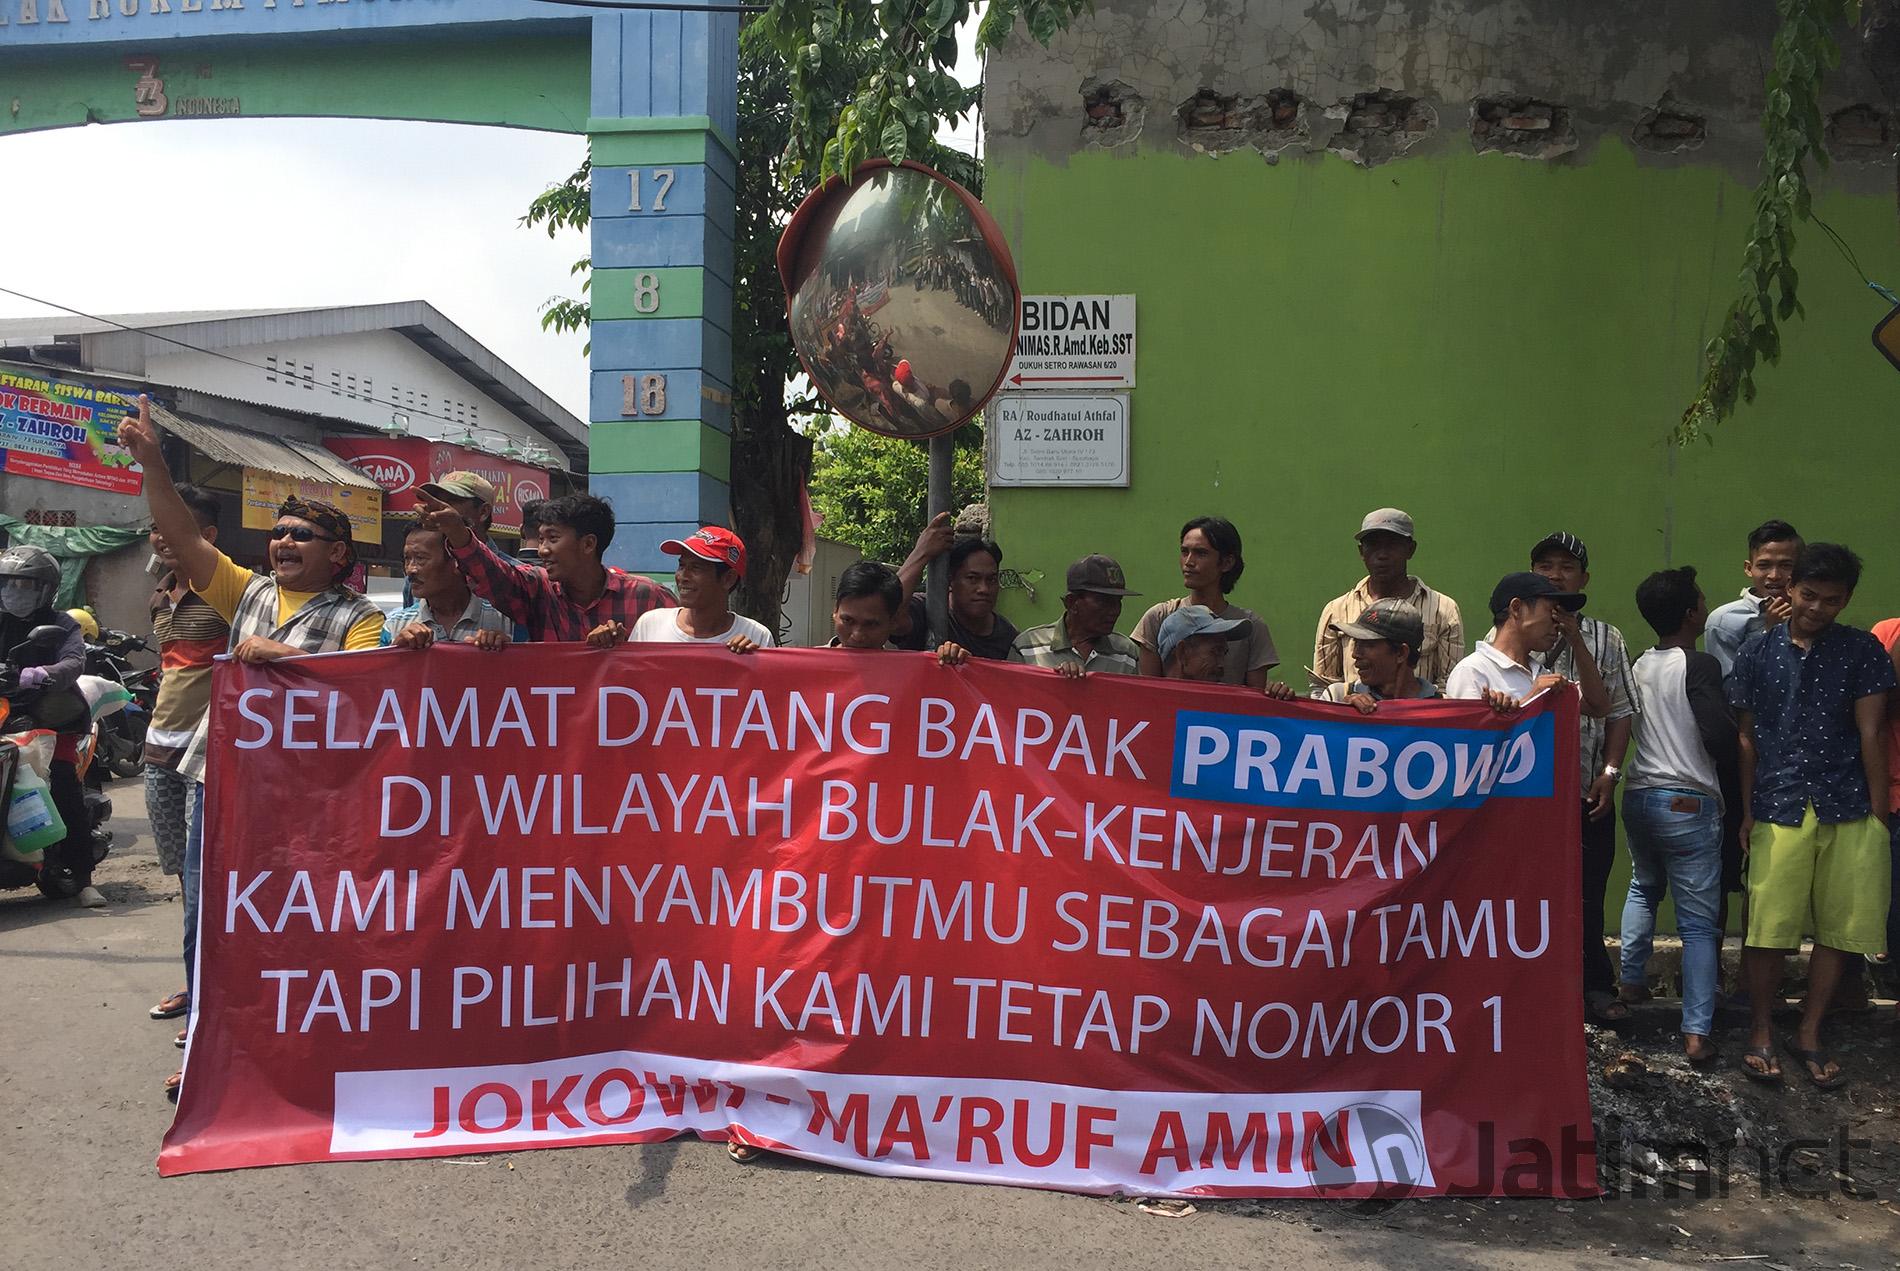 Prabowo Disambut Spanduk 01 di Kandang Banteng